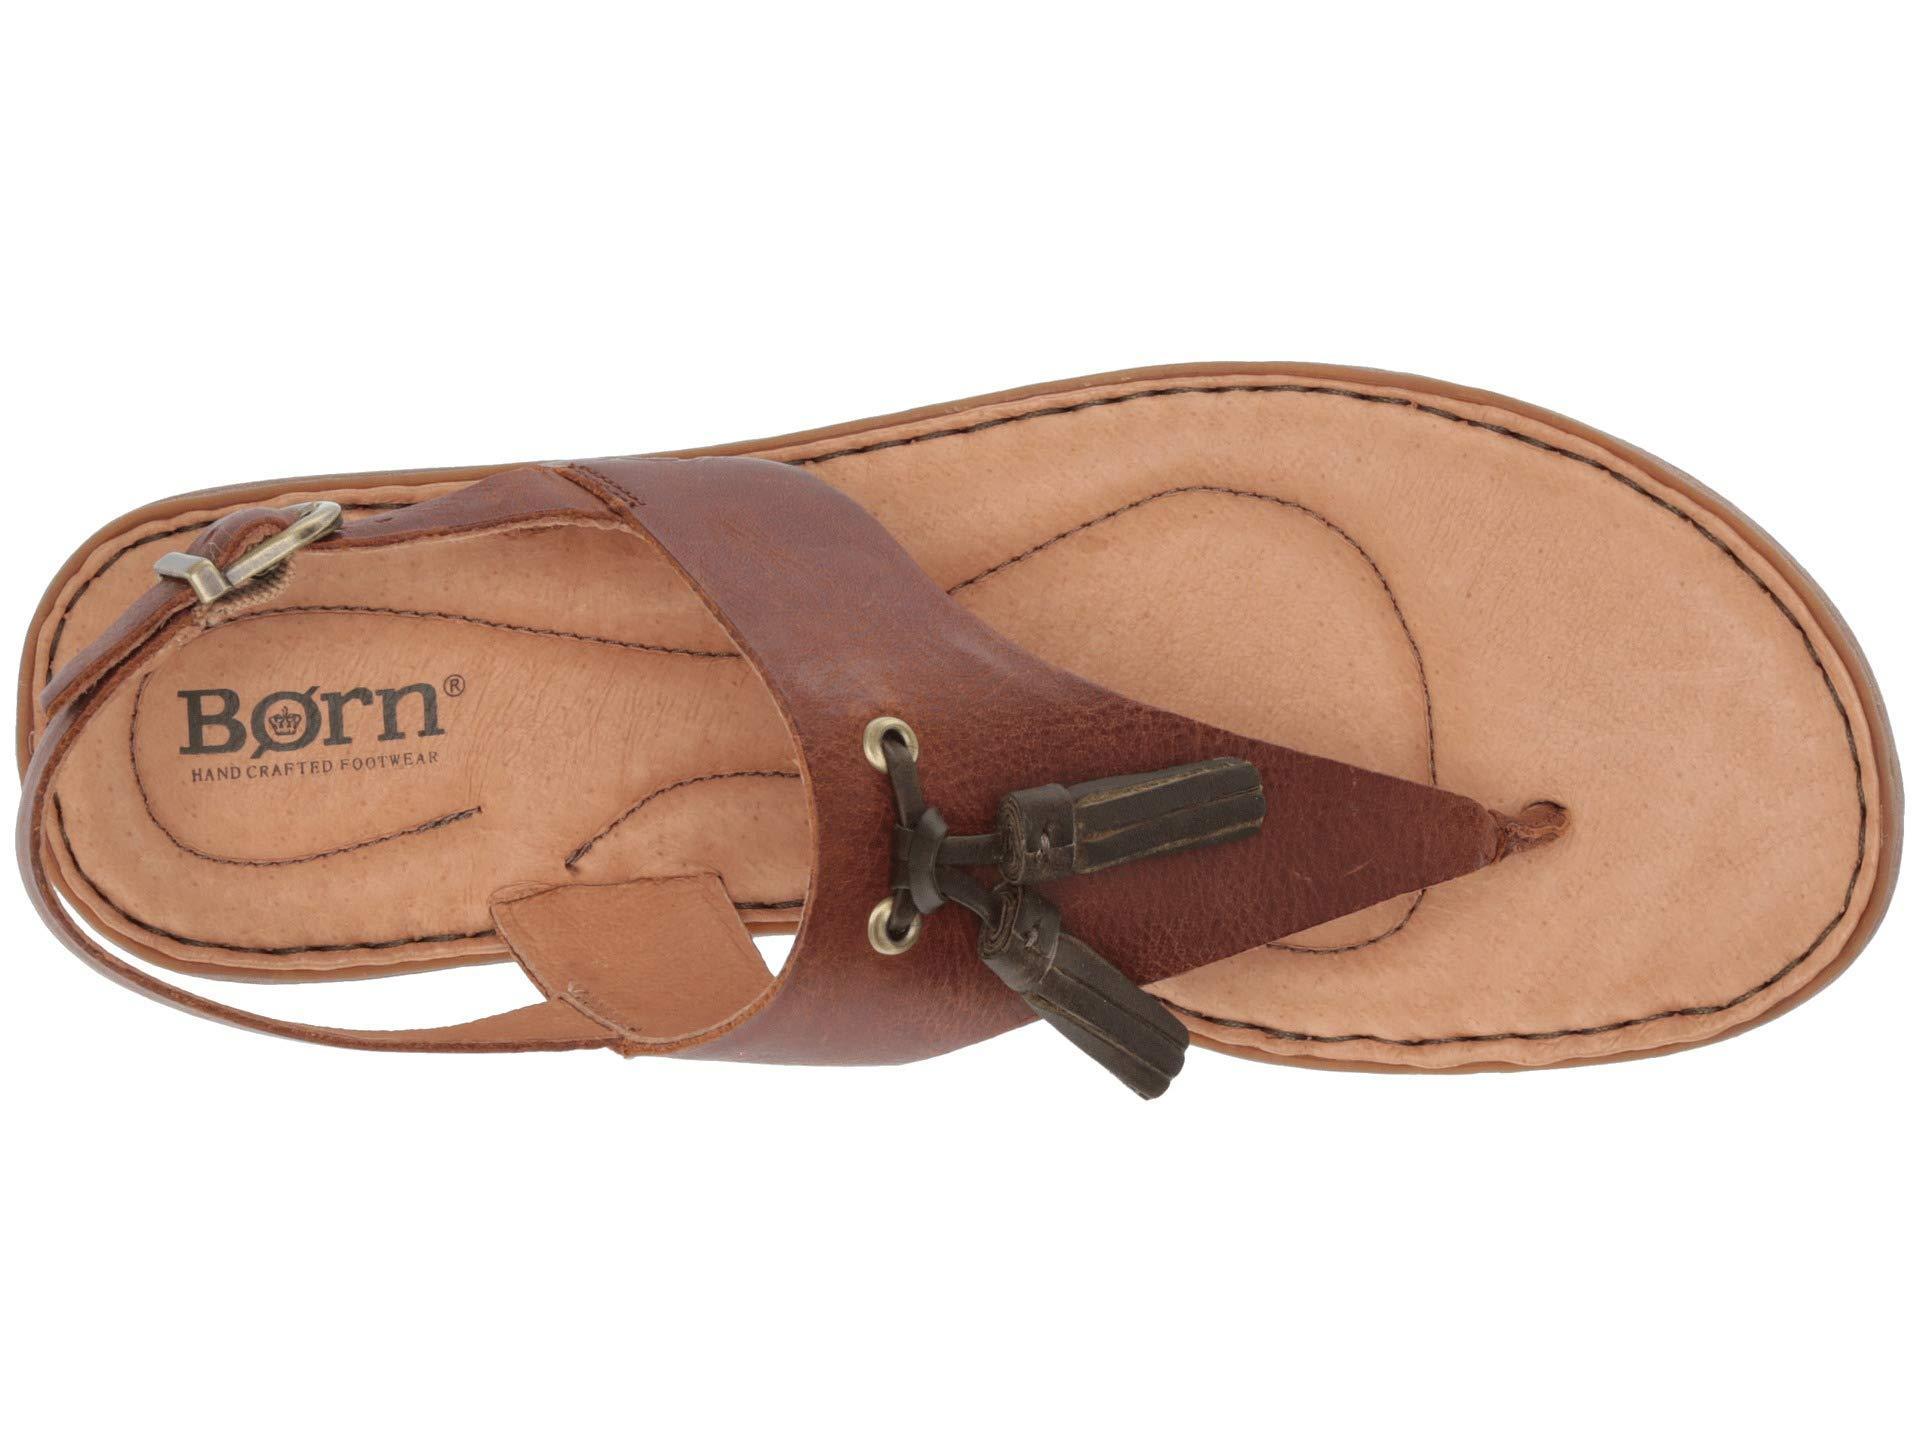 9f58e0c28724 Lyst - Born St. Joe (tan Full Grain Leather) Women s Sandals in Brown